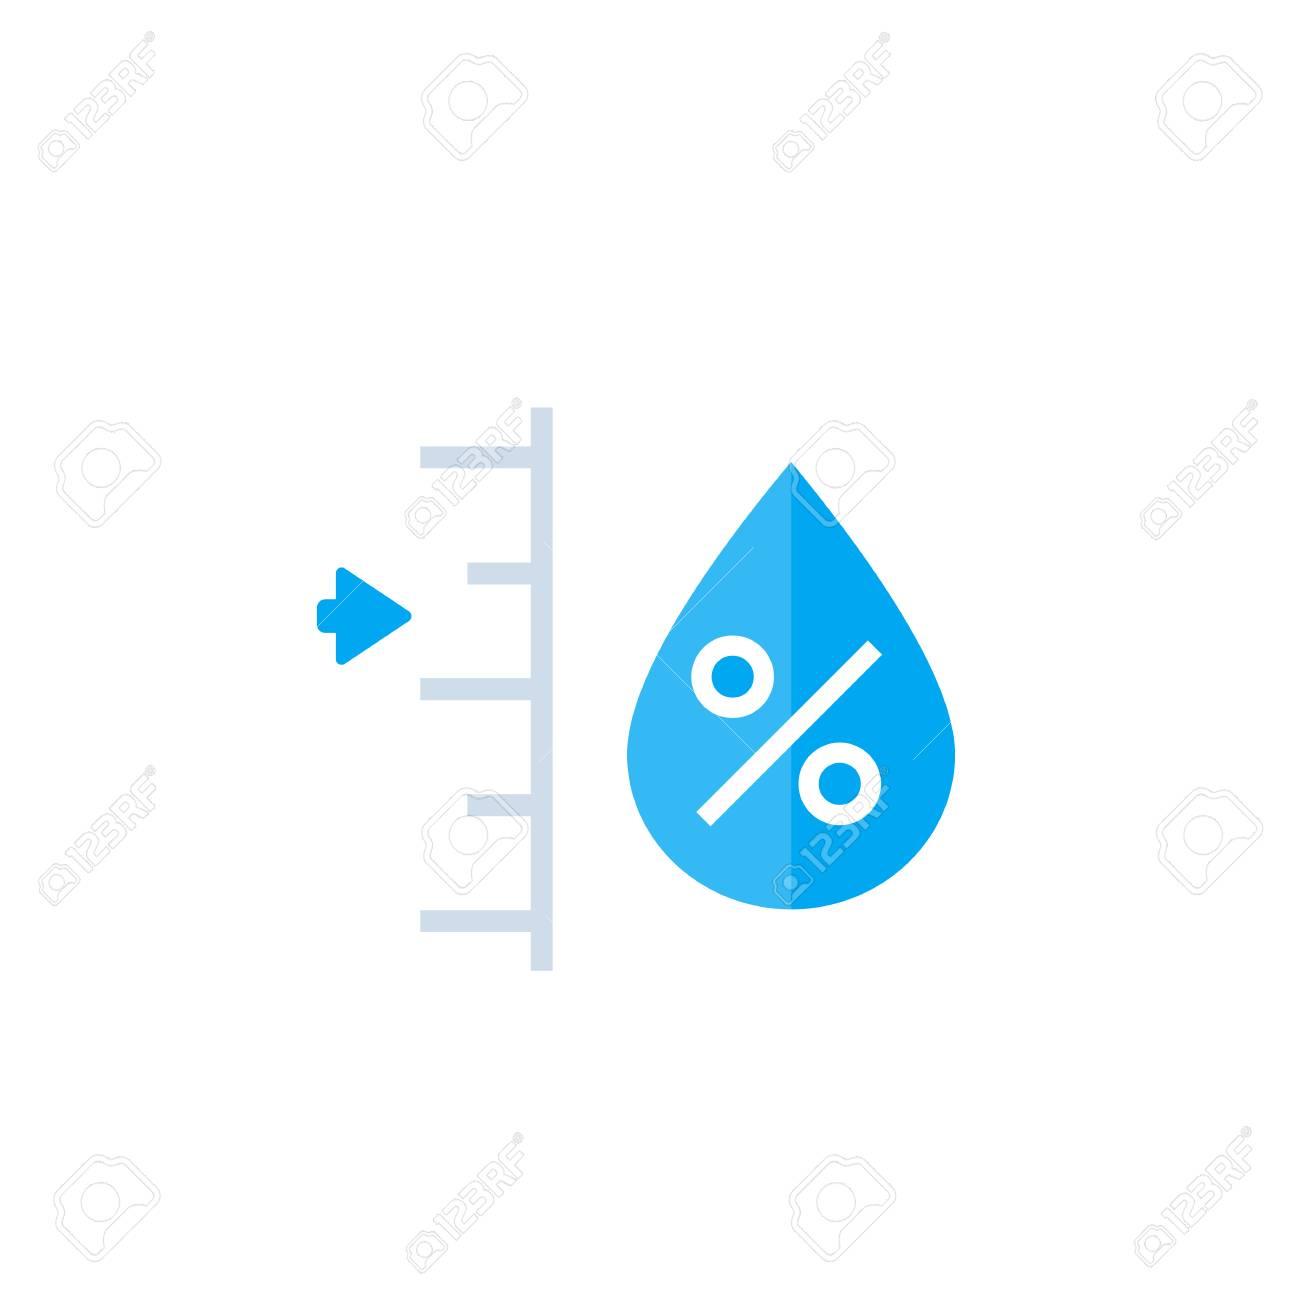 humidity level vector - 110297670